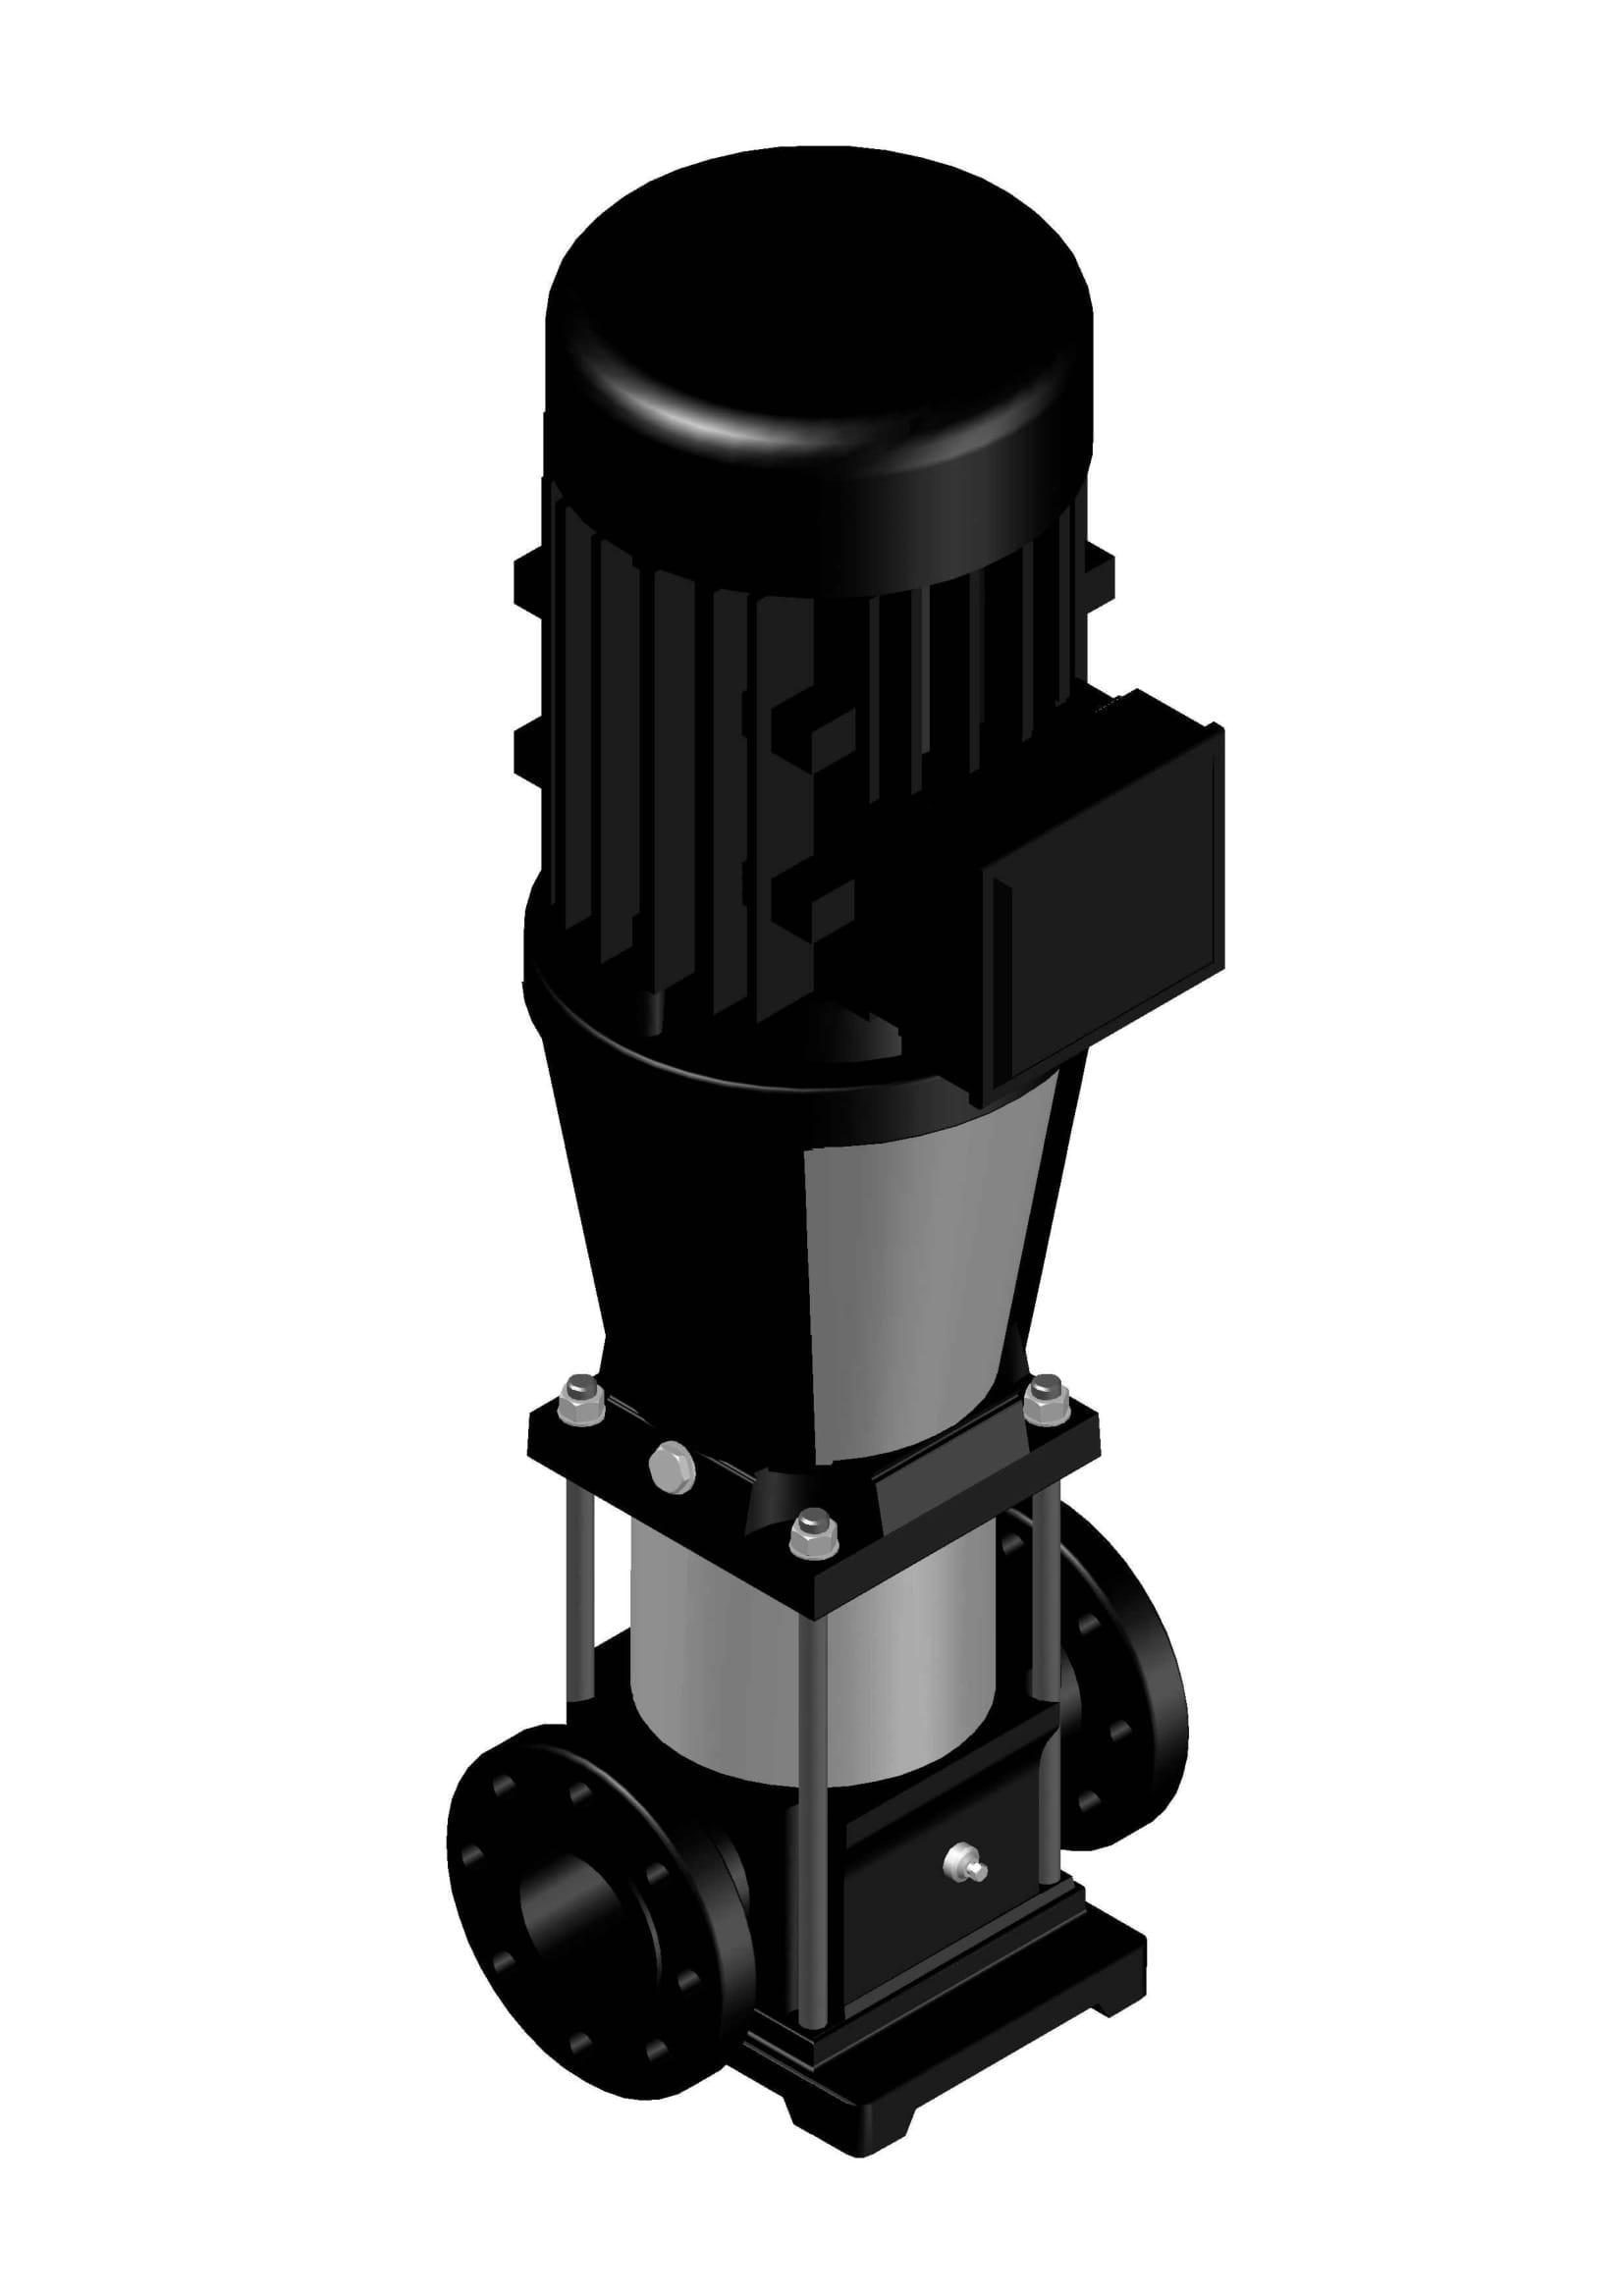 BV 64-02-01